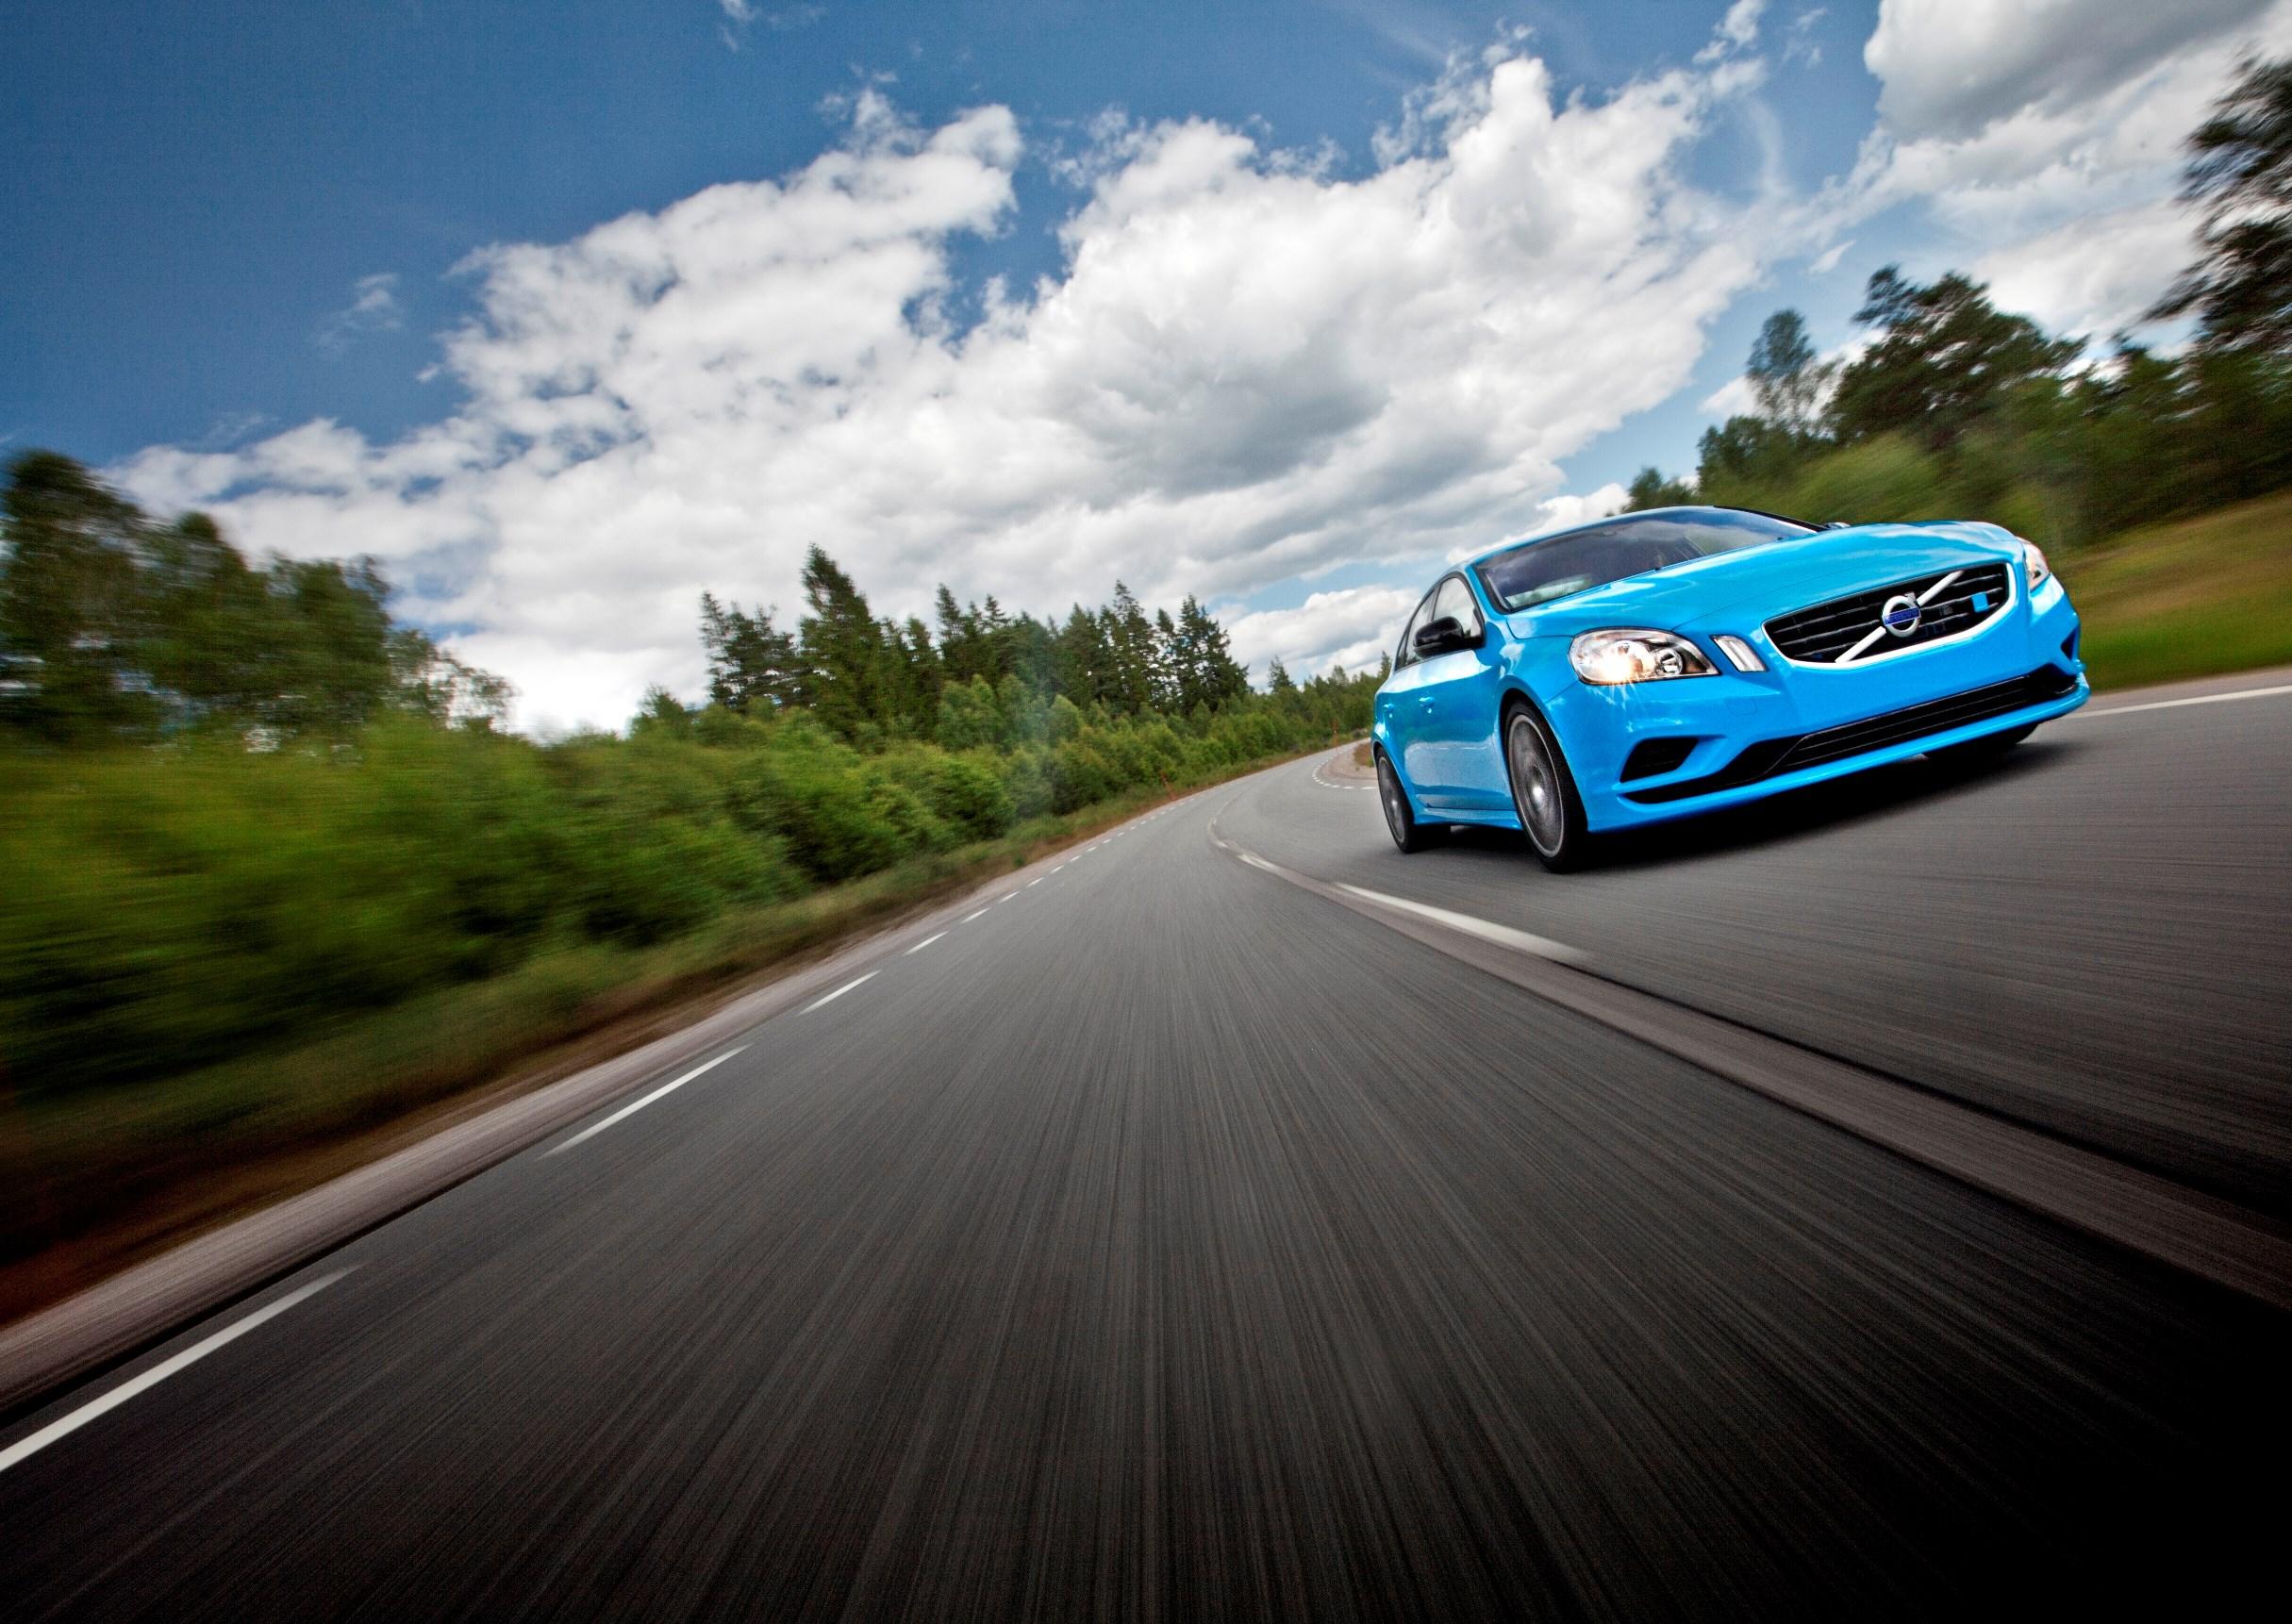 47490_Volvo_S60_Polestar_Concept